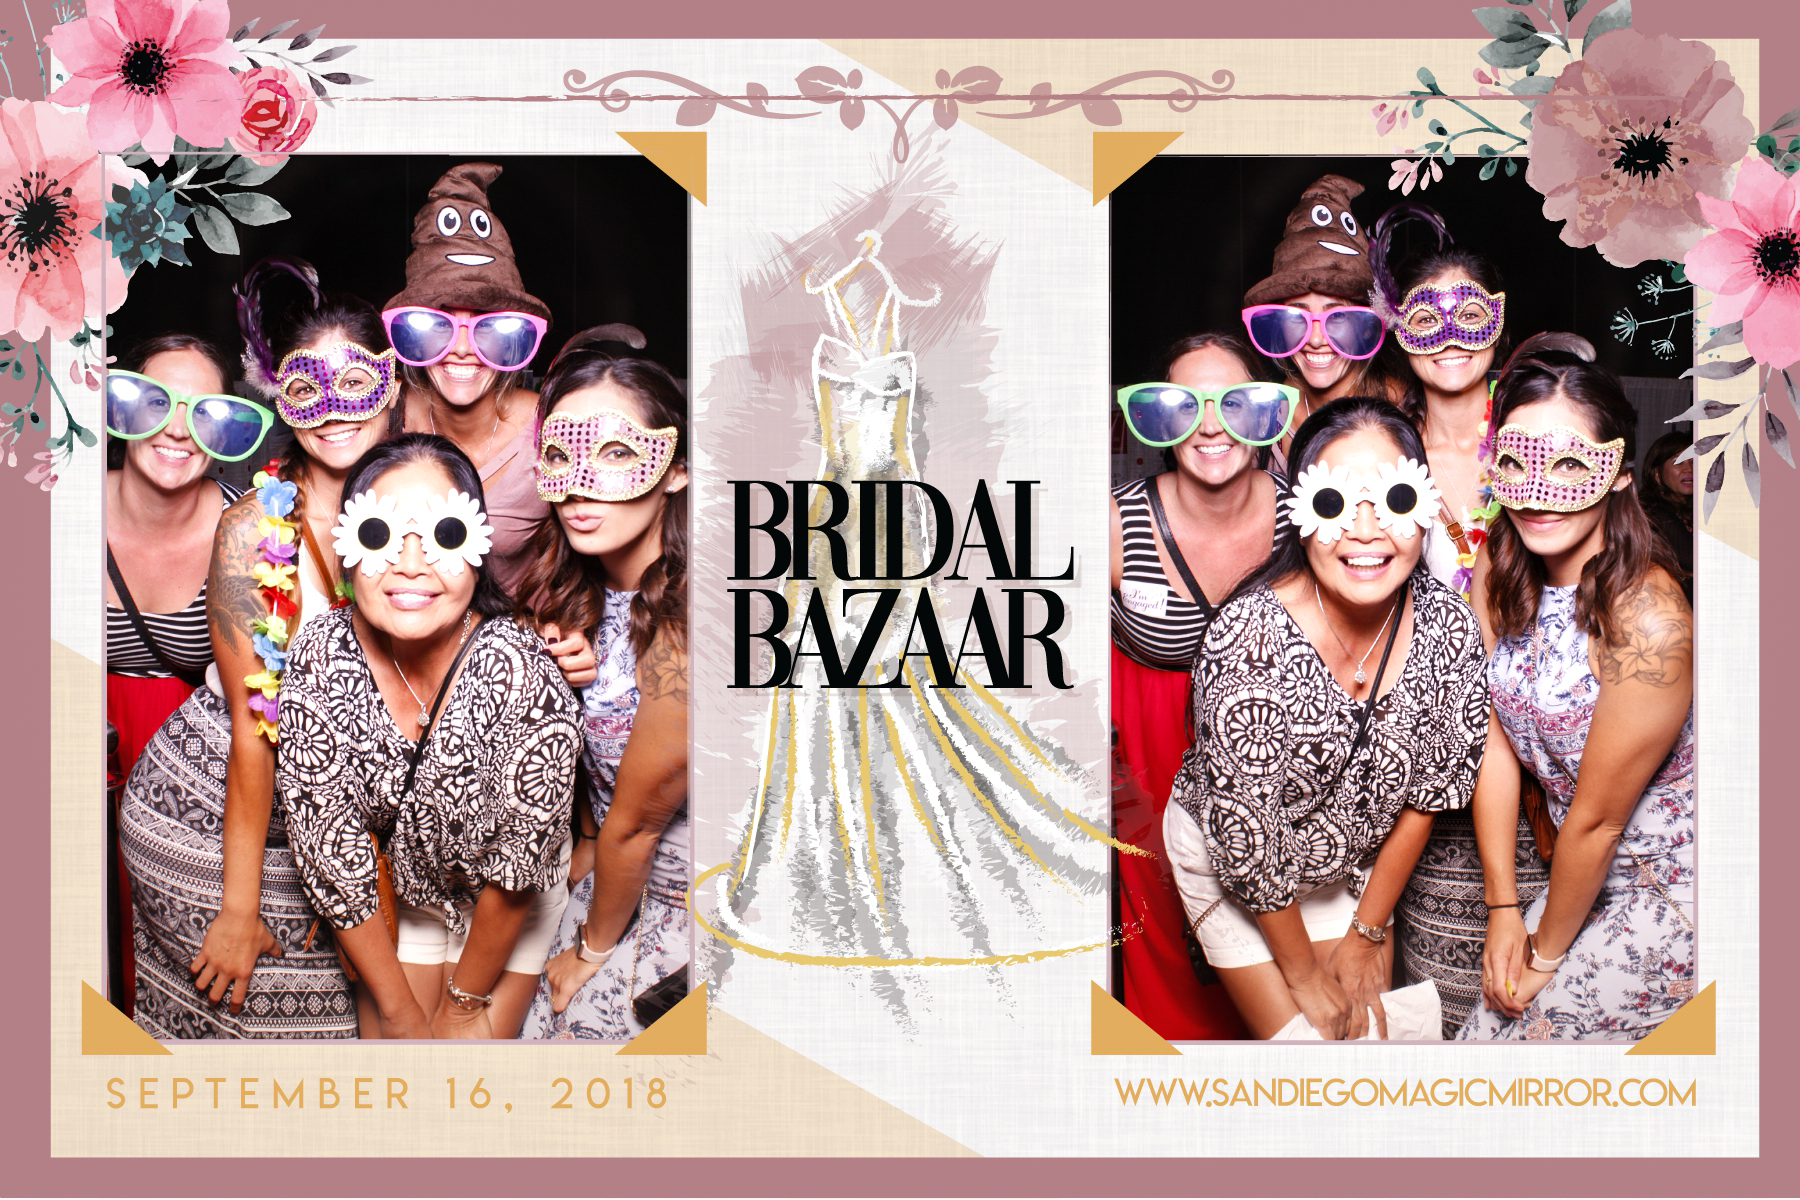 San Diego Magic Mirror Photo Booth at The Bridal Bazaar Convention Center